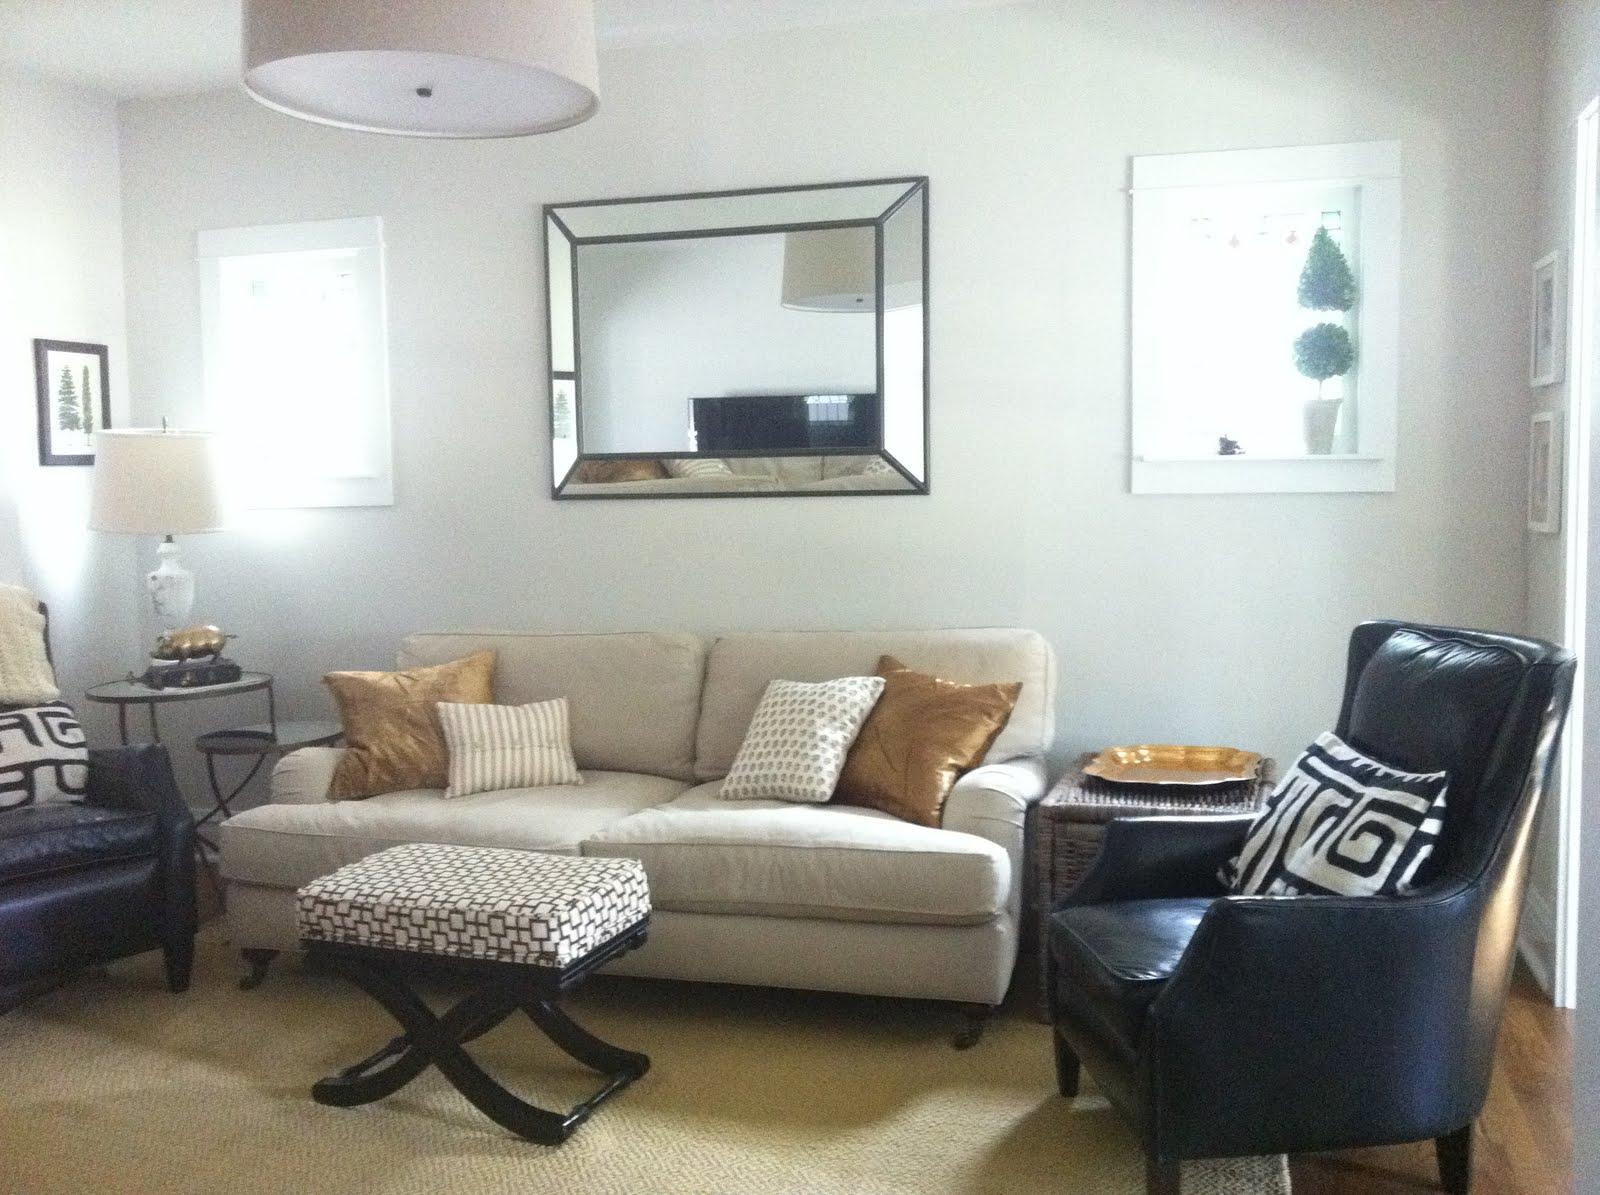 Wonderwall: Update on my living room...new lamp, new rug, etc